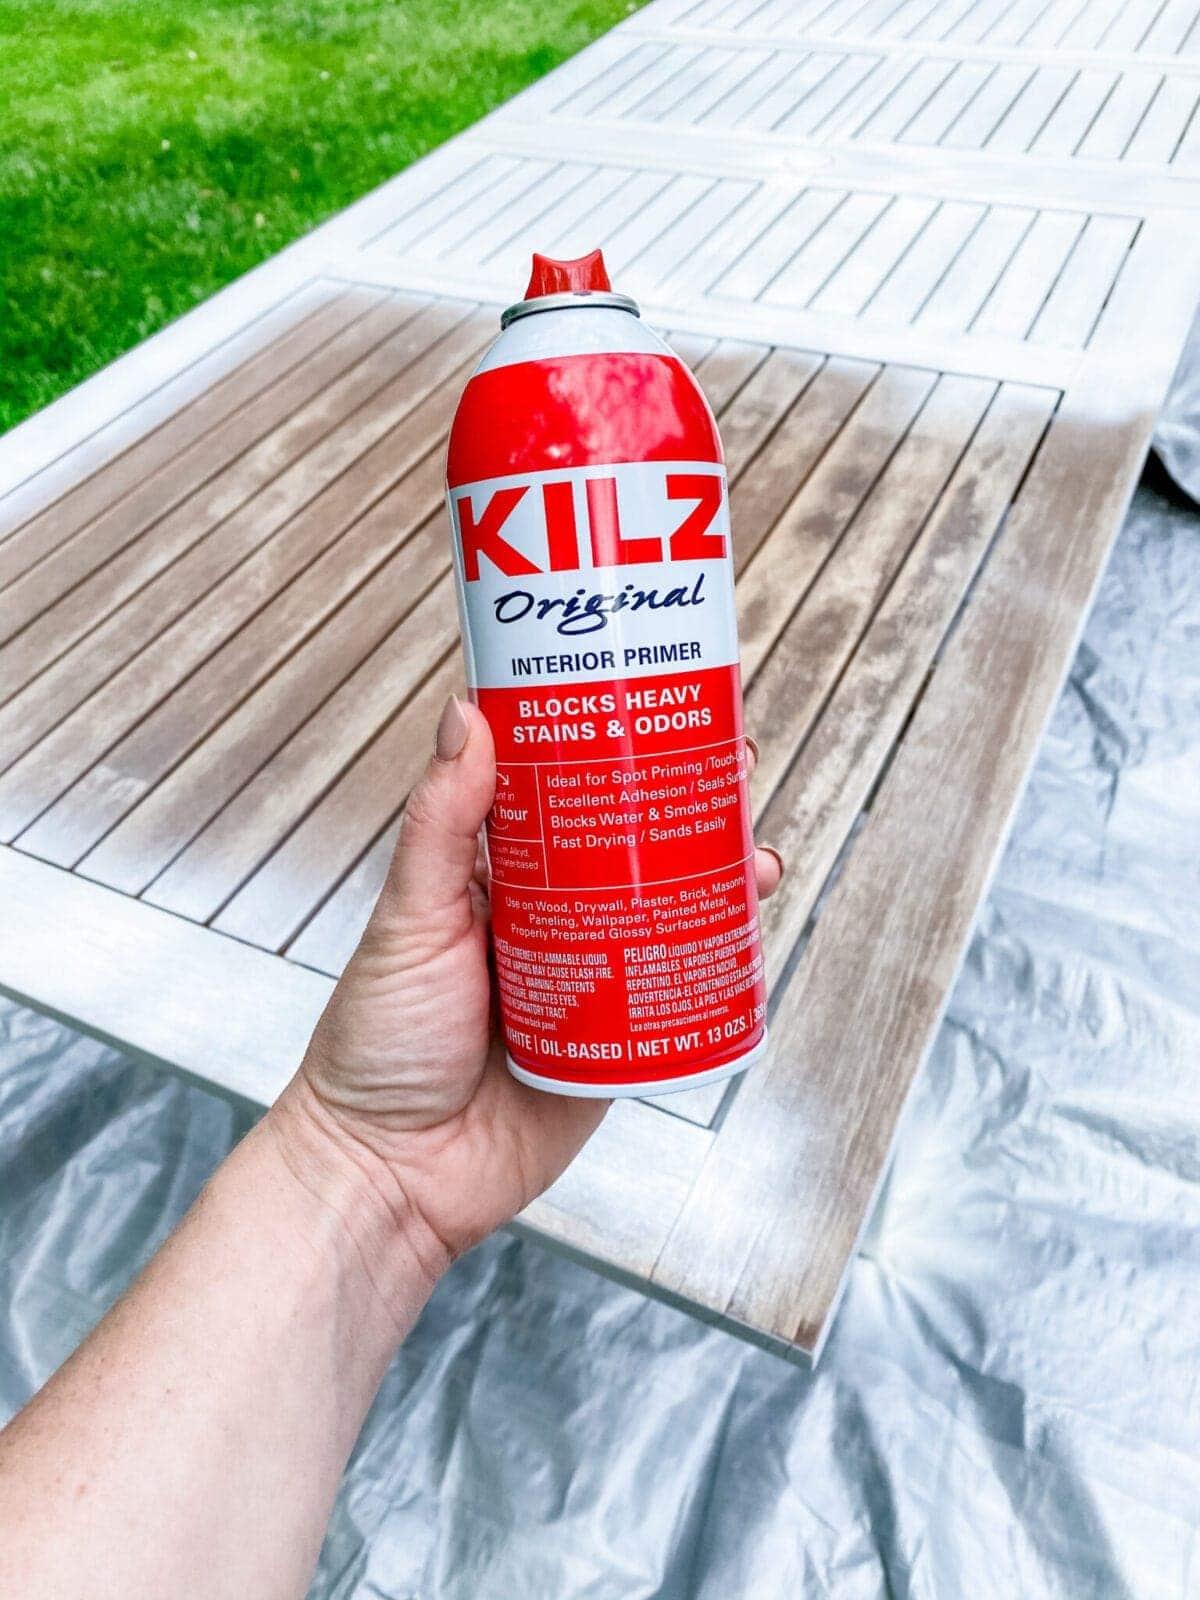 kilz original spray primer to use on outdoor furniture